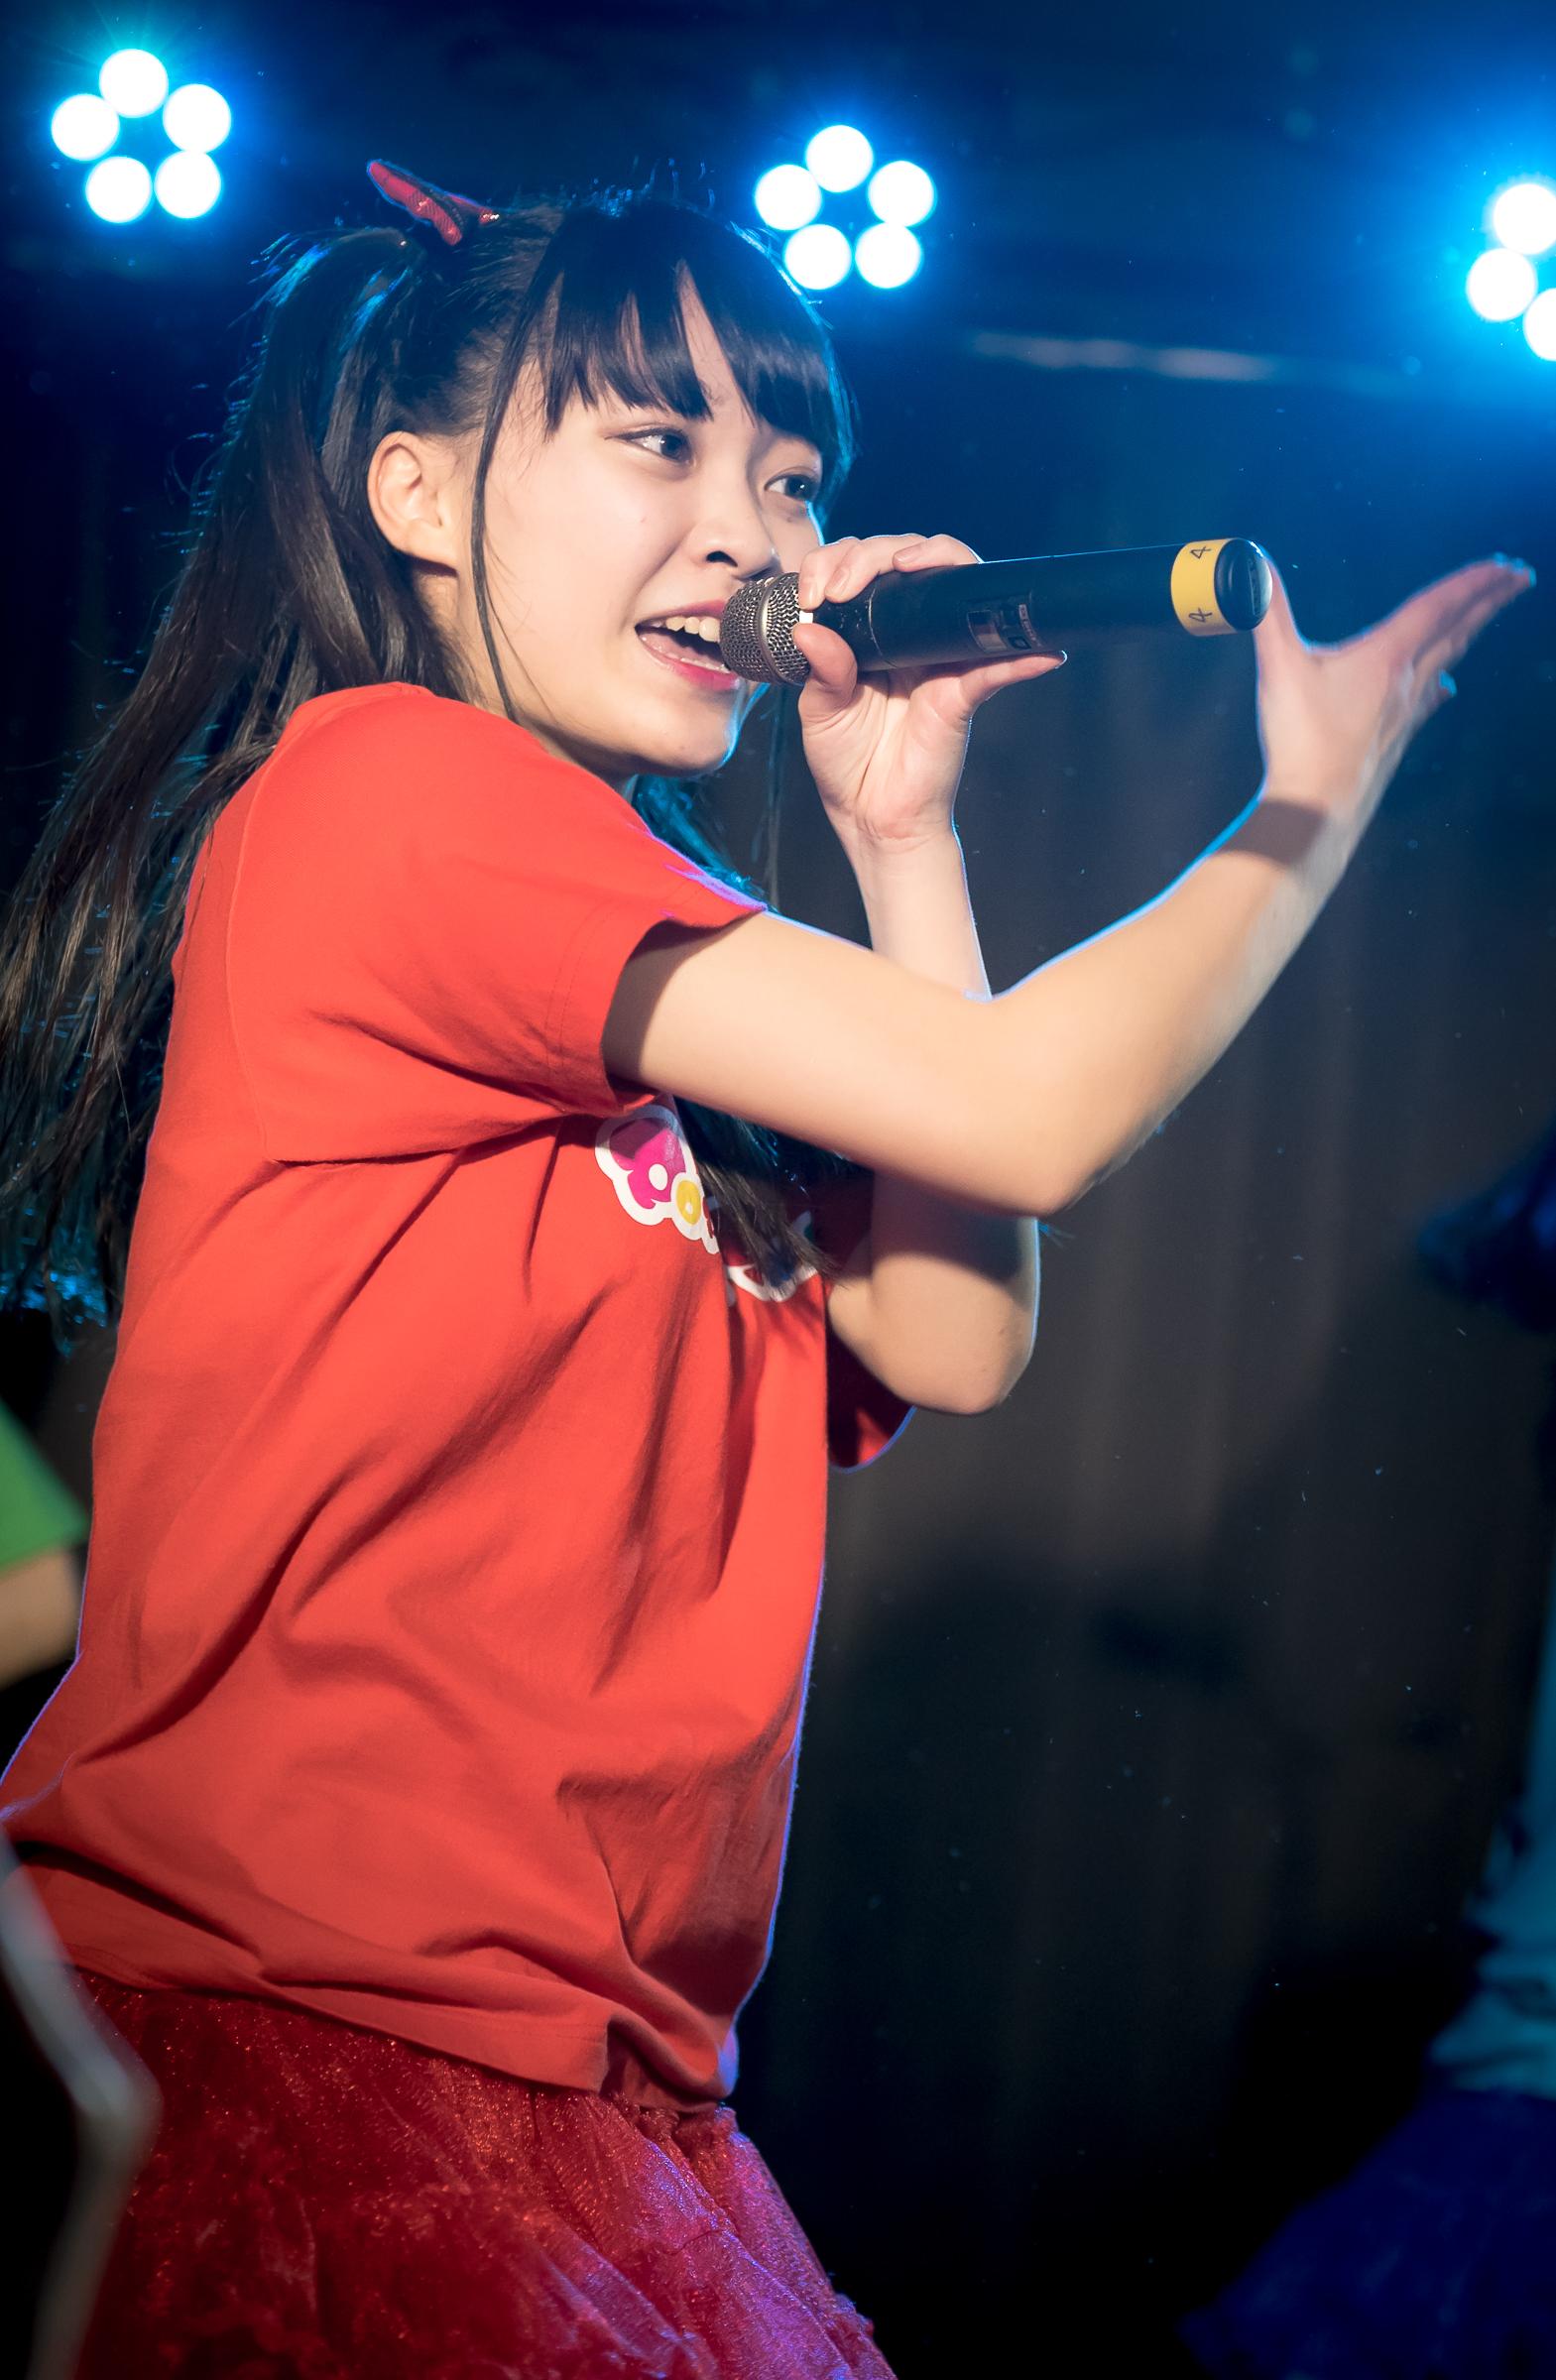 POPPING☆SMILE あゆり ( 福山愛由梨 ) | イベントお疲れ様でした!イベント